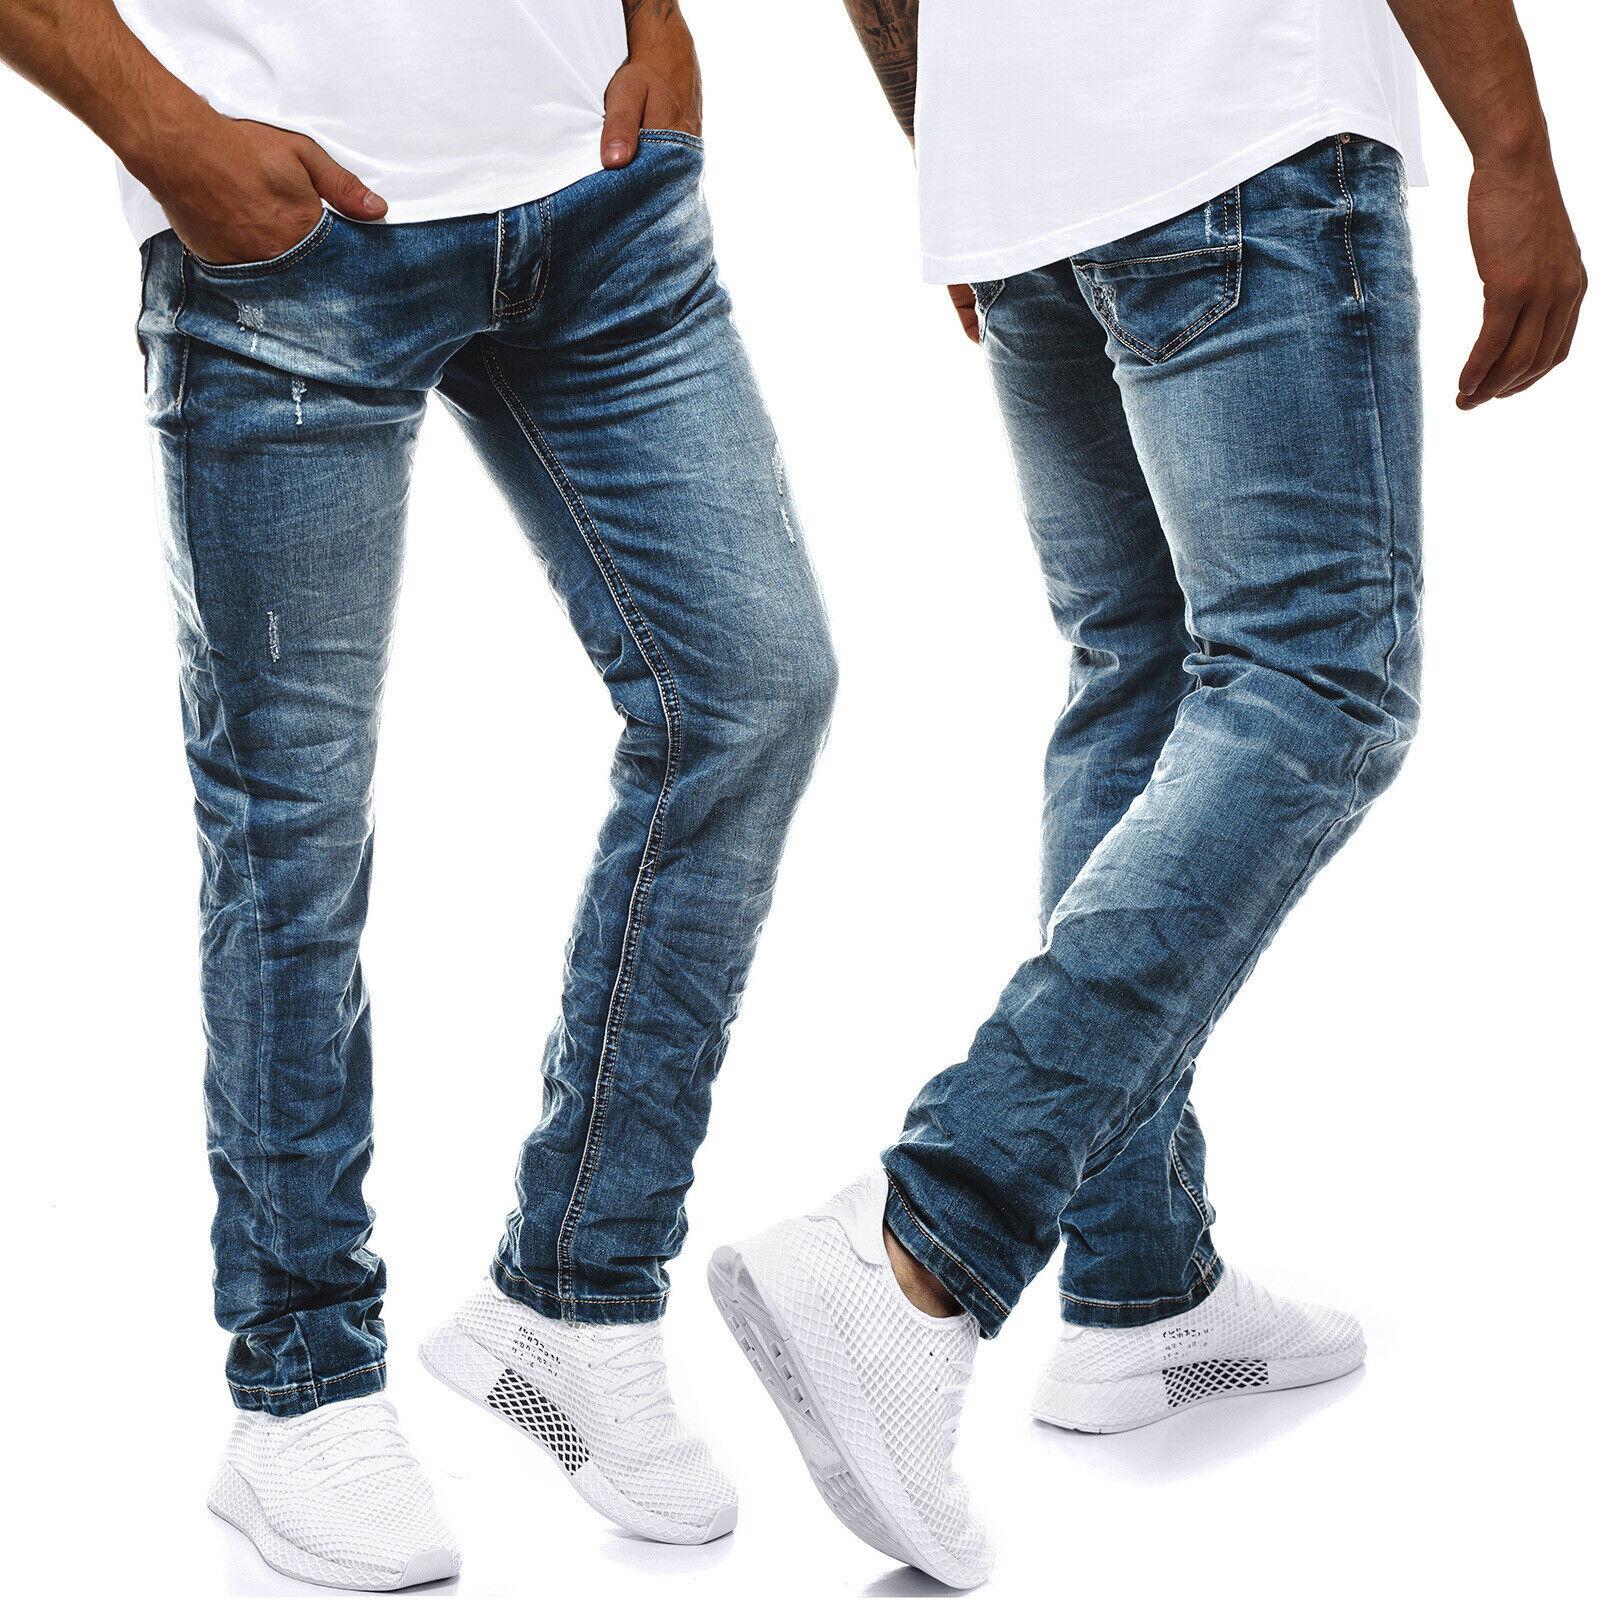 Jeanshose Röhrenjeans Straight Cut Clubwear Slim Fit Hosen OZONEE DP//576 Herren